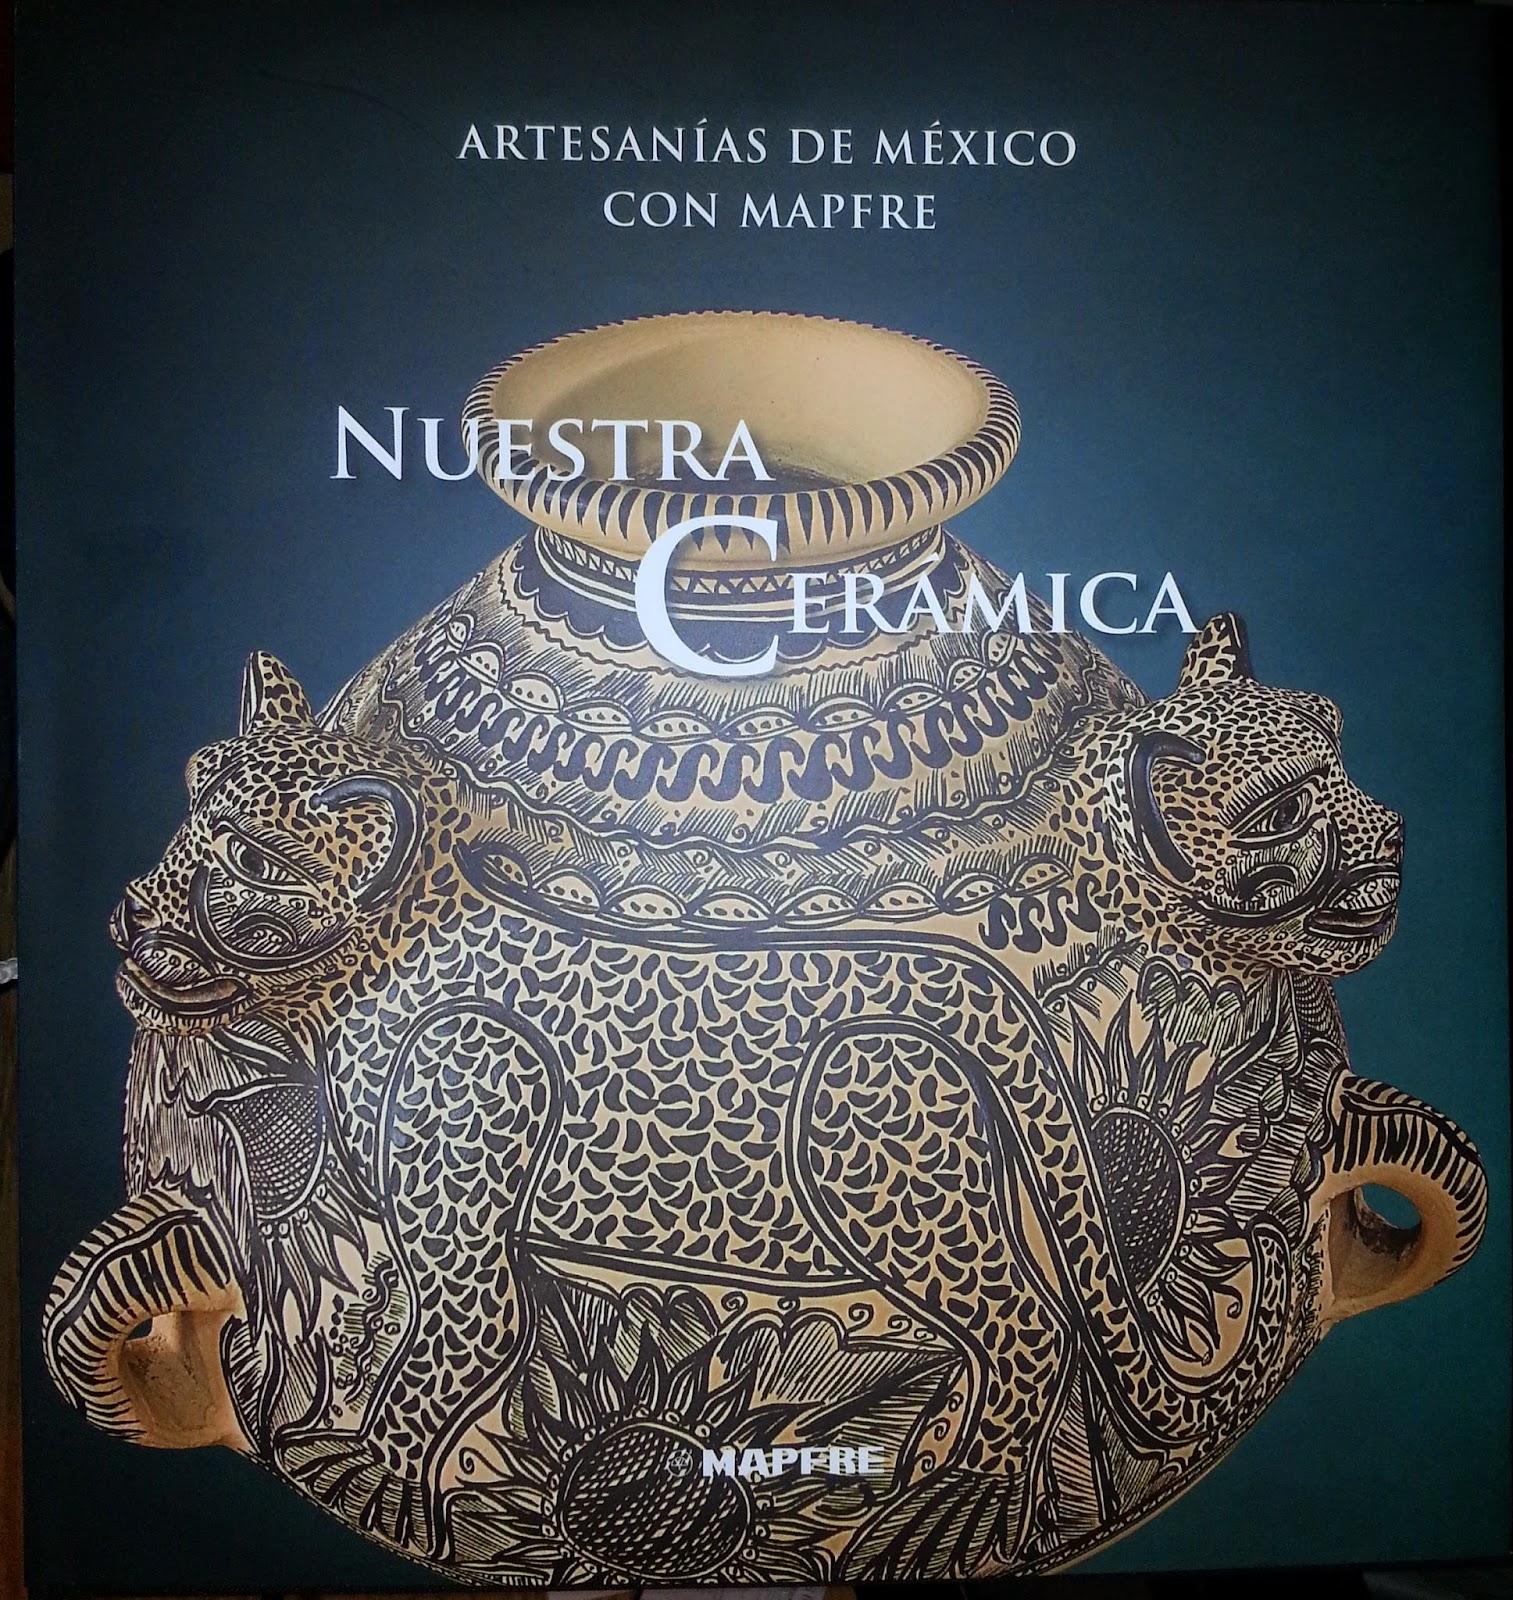 Nuestra cerámica